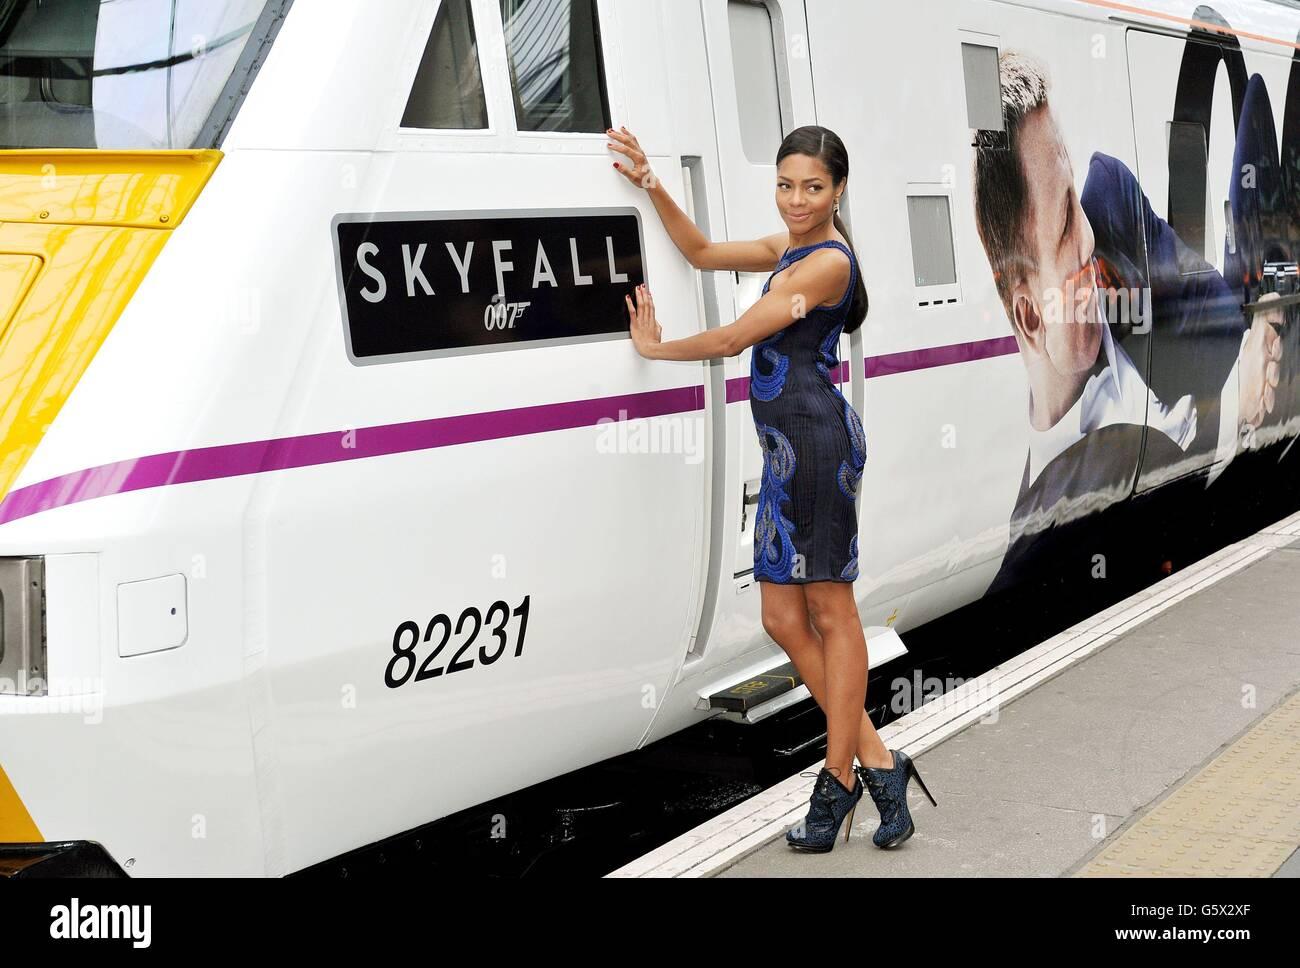 Skyfall East Coast train Stock Photo: 106908551 - Alamy